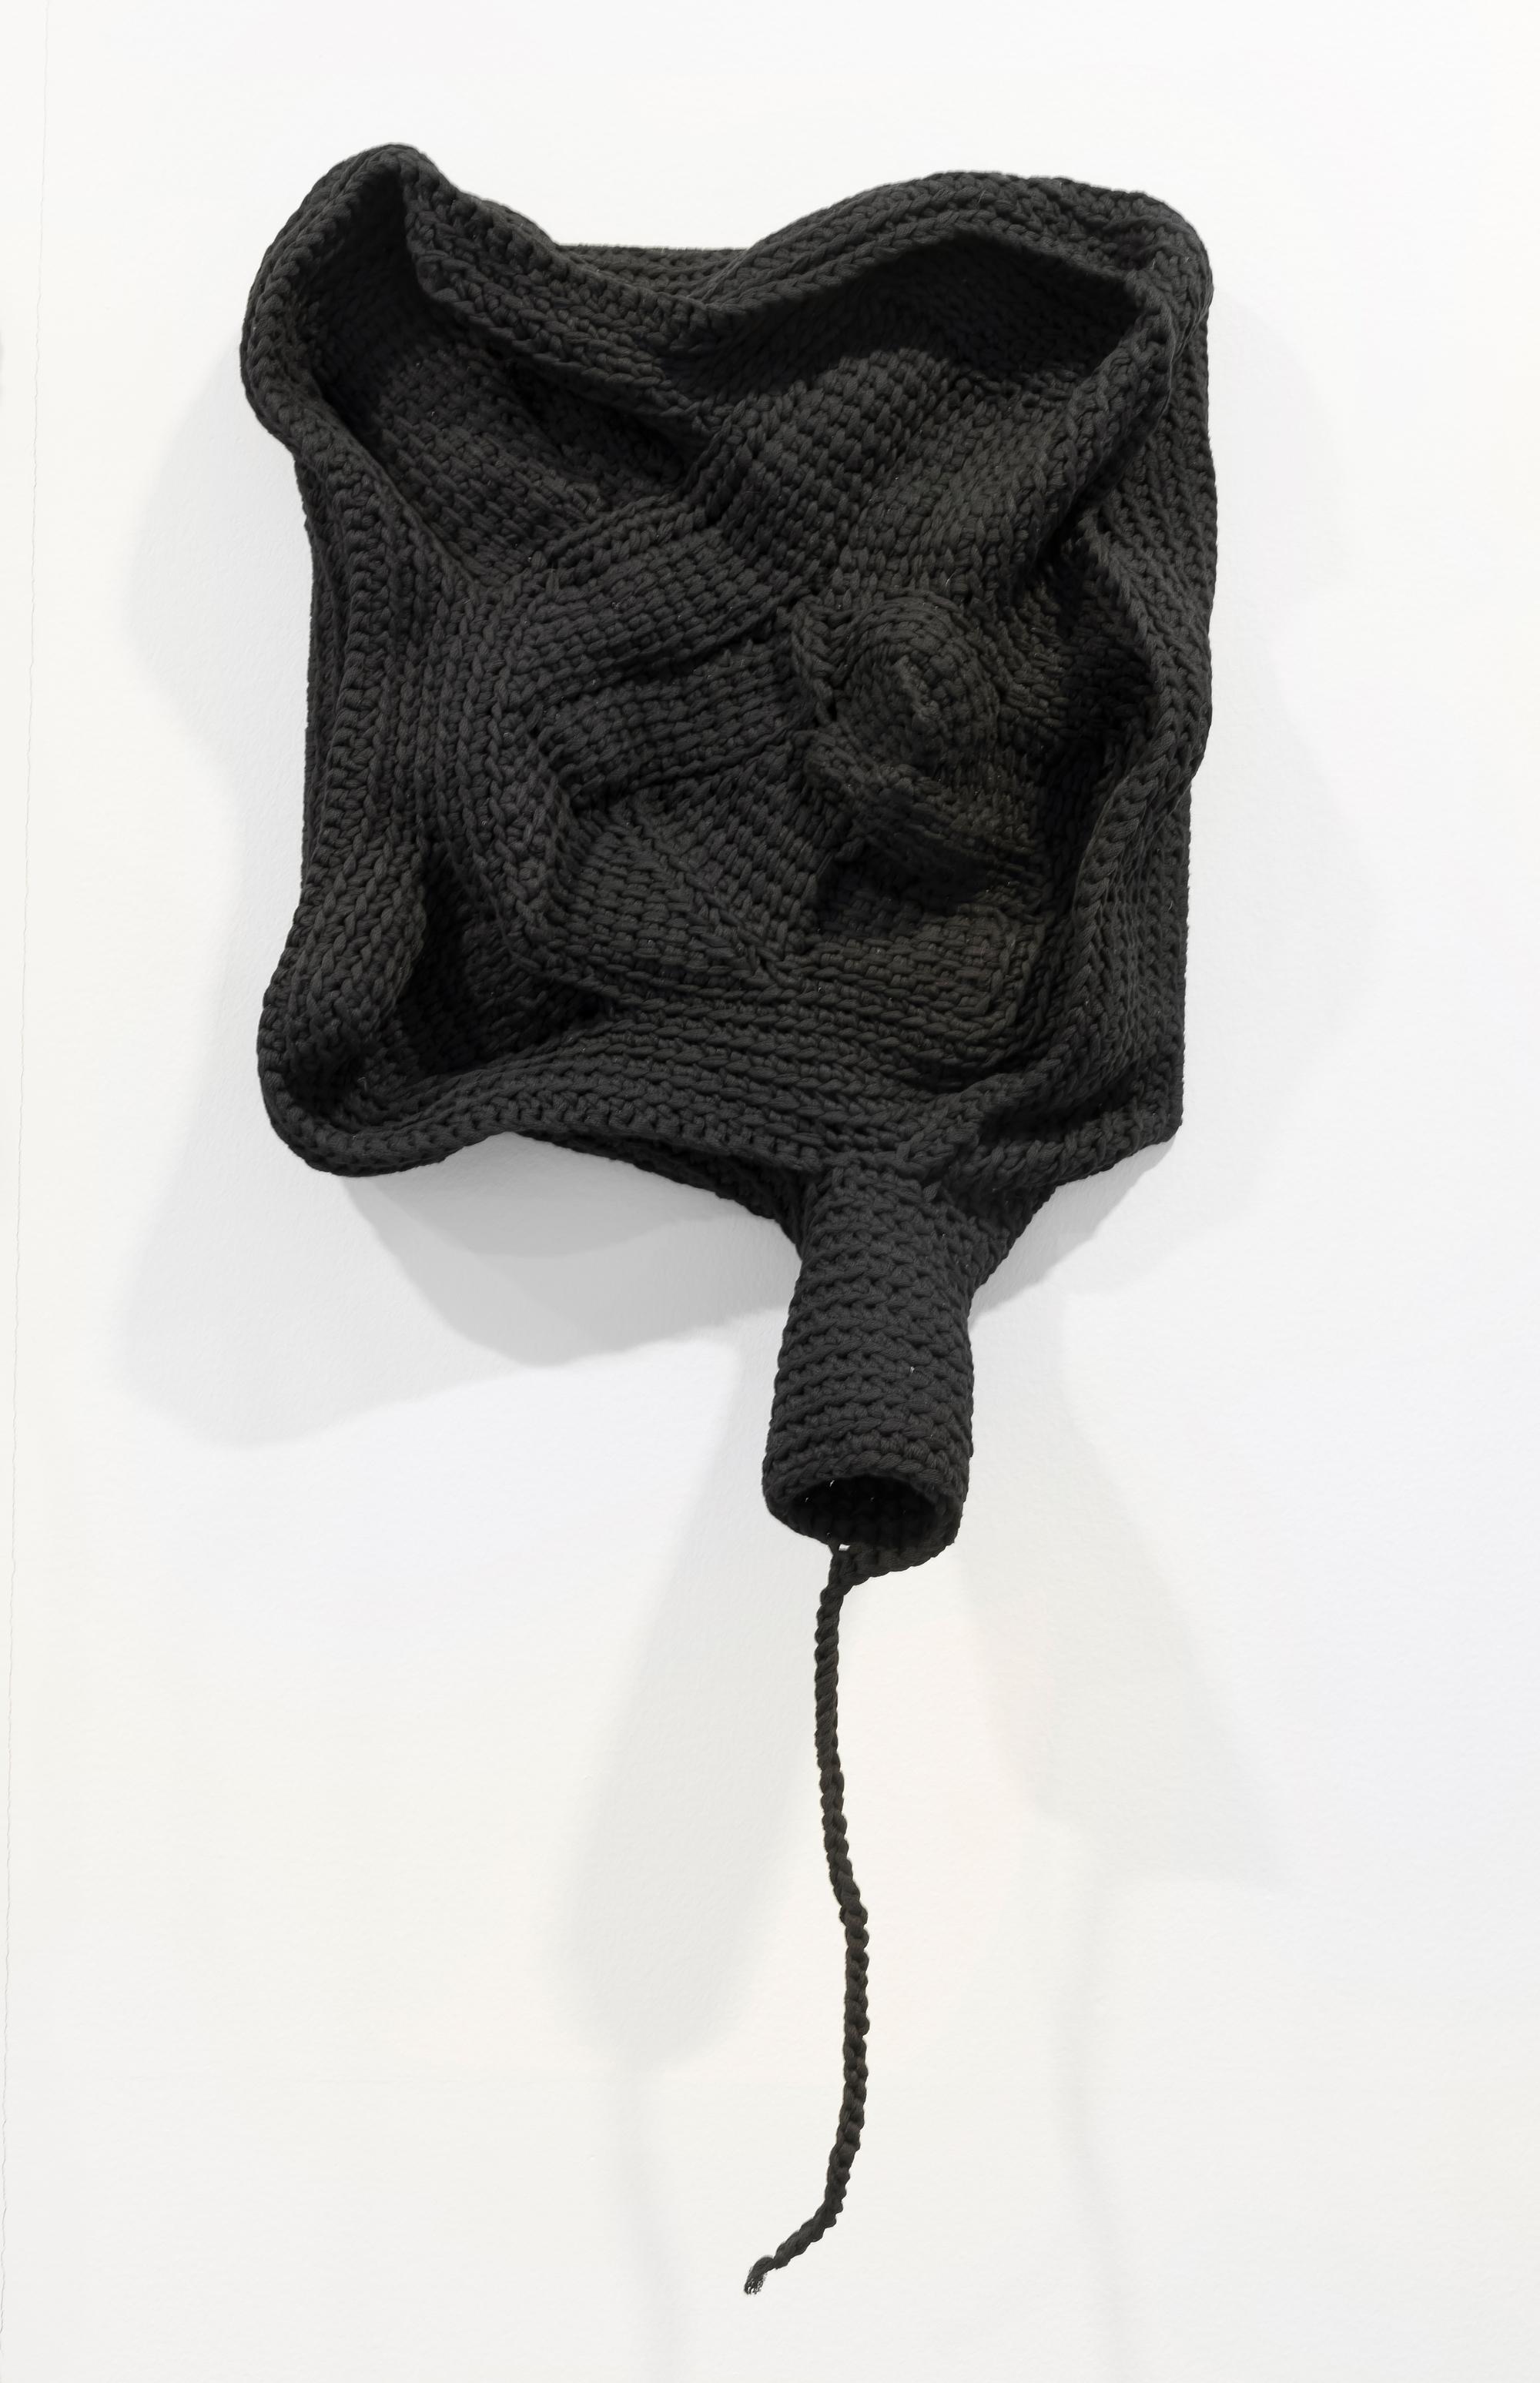 Leif Homstrand, fra serien  Breeder Covers  Clastoderma debaryanum: black, crocheted wall objects with individual slime mold-inspired subtitles.Foto:Øystein Thorvaldsen